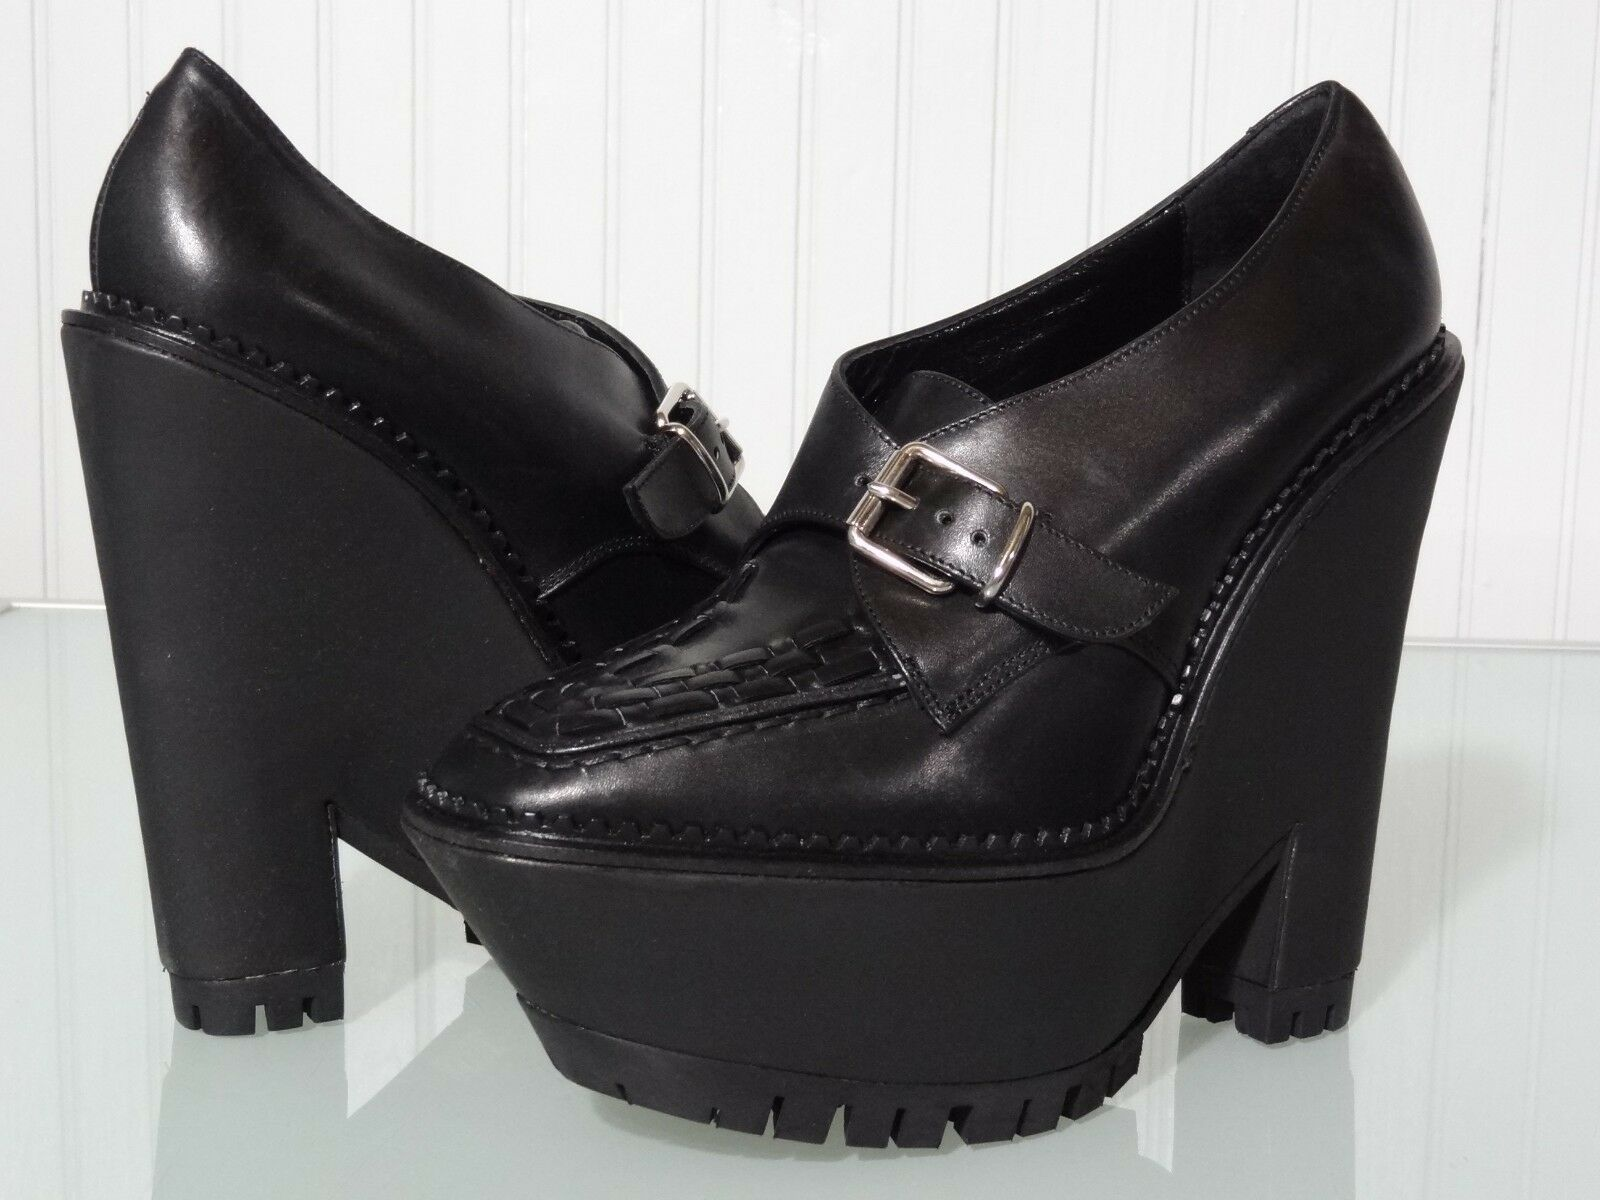 Nuevo En Caja  950 Para Mujer Burberry Prorsum Prorsum Prorsum Anglesey Cuña Monje zapatos Talla 8 9 nos Bota Negra  precios mas bajos